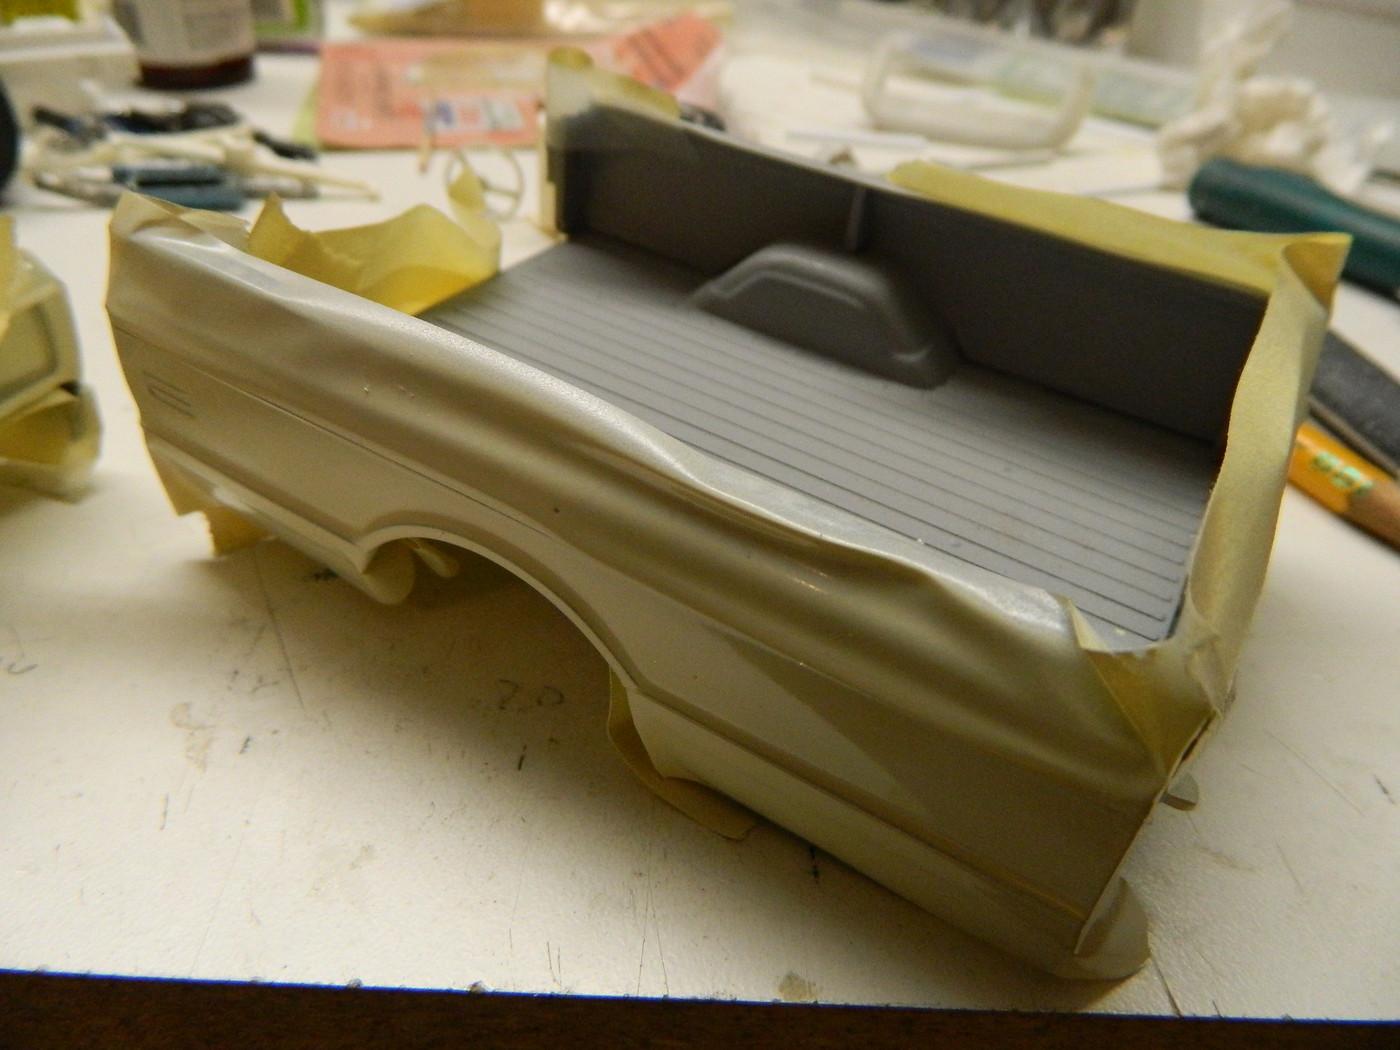 72 Chevrolet Fleetside